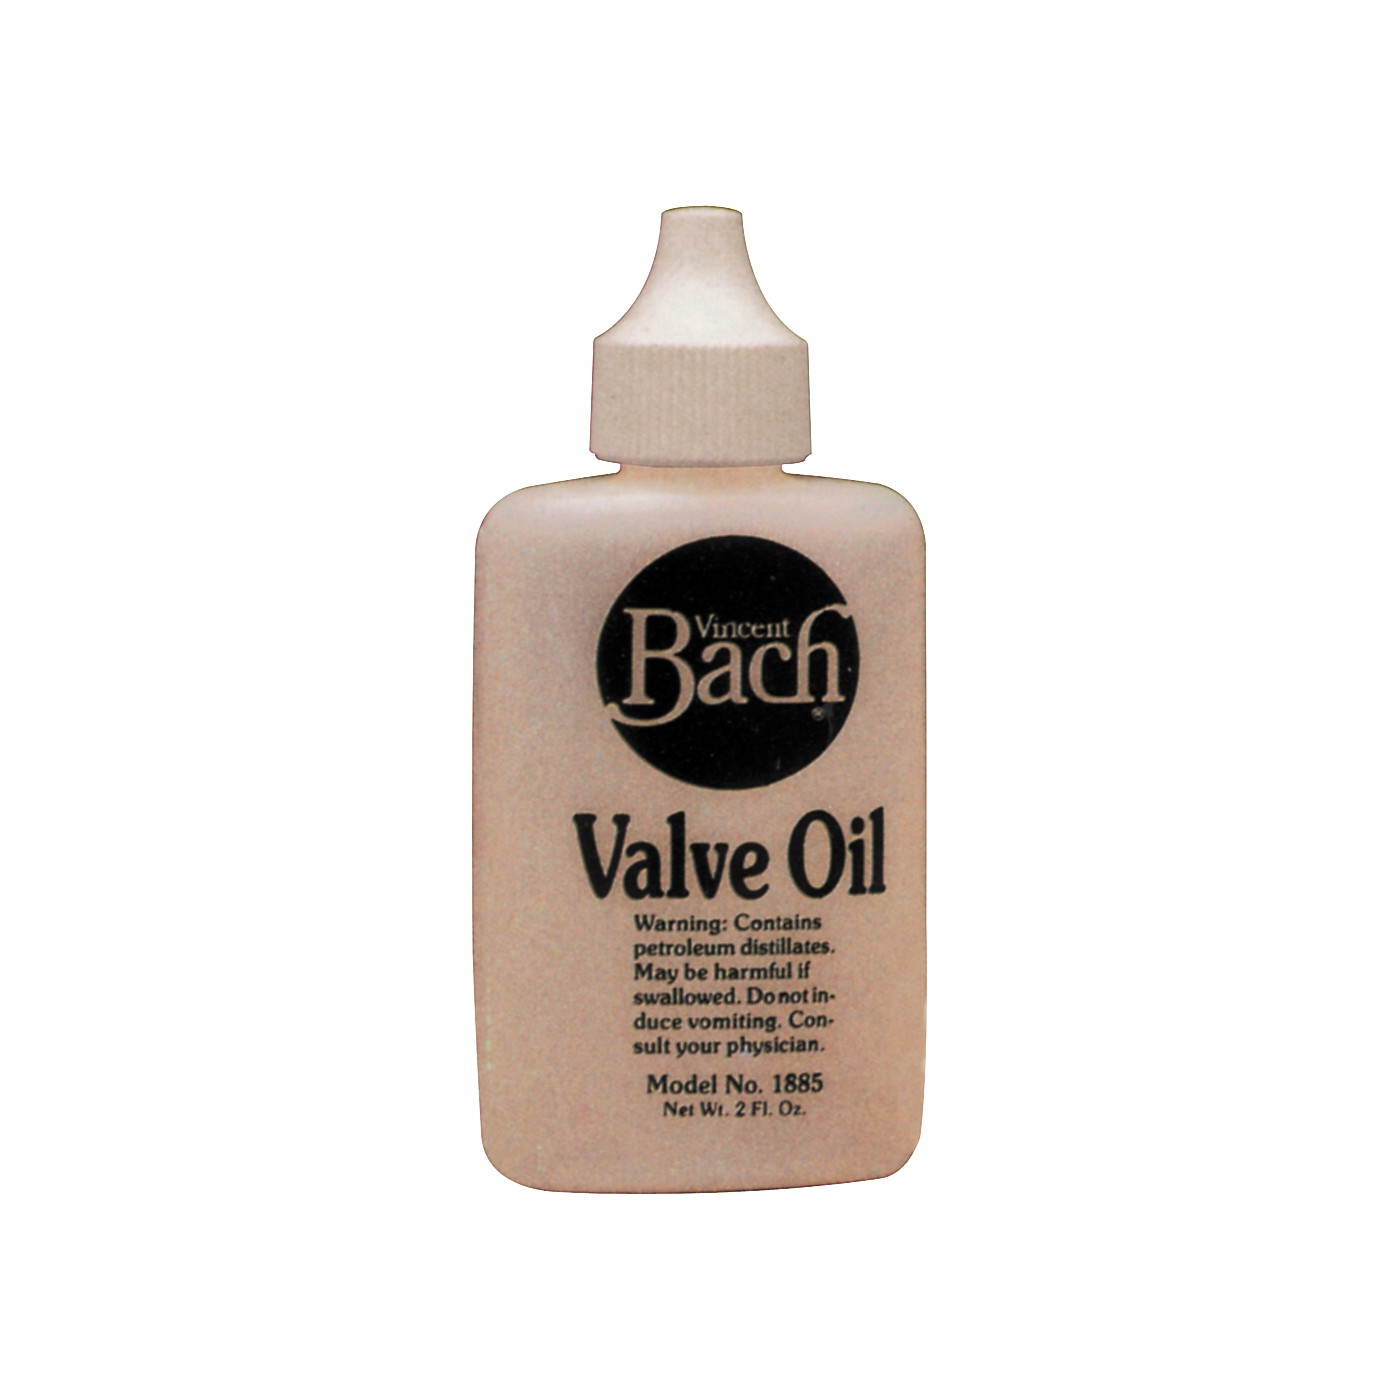 Bach 1885 Valve Oil 1.6 oz Regular thumbnail